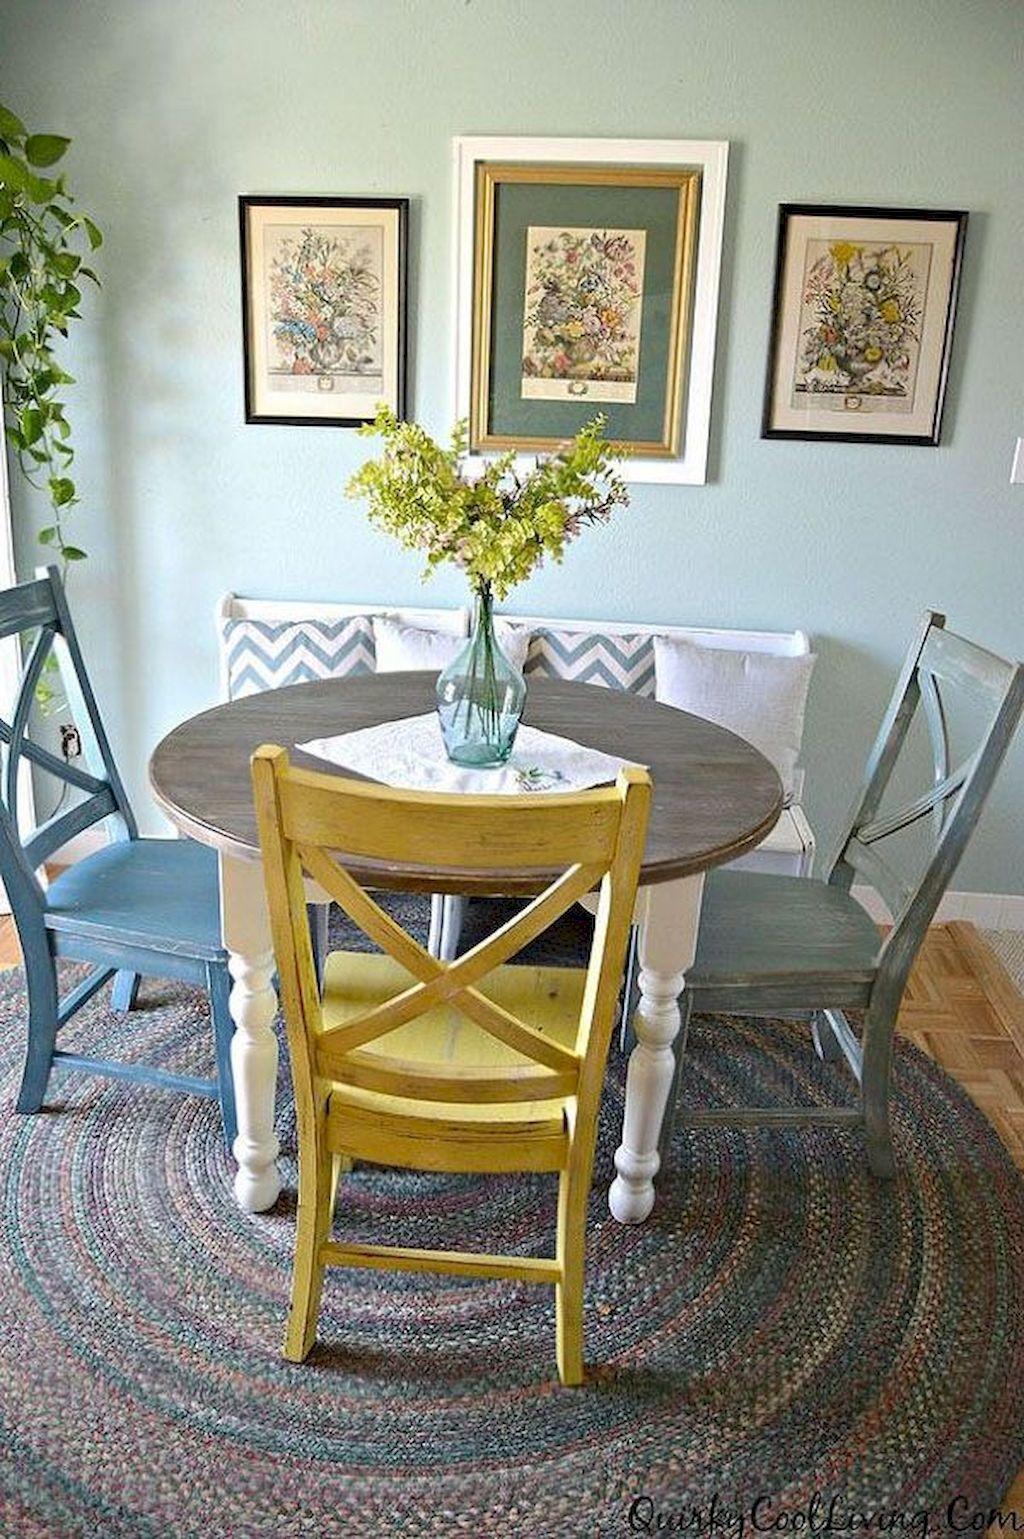 65 Small Dining Room Table & Decor Ideas   Gladecor.com ...